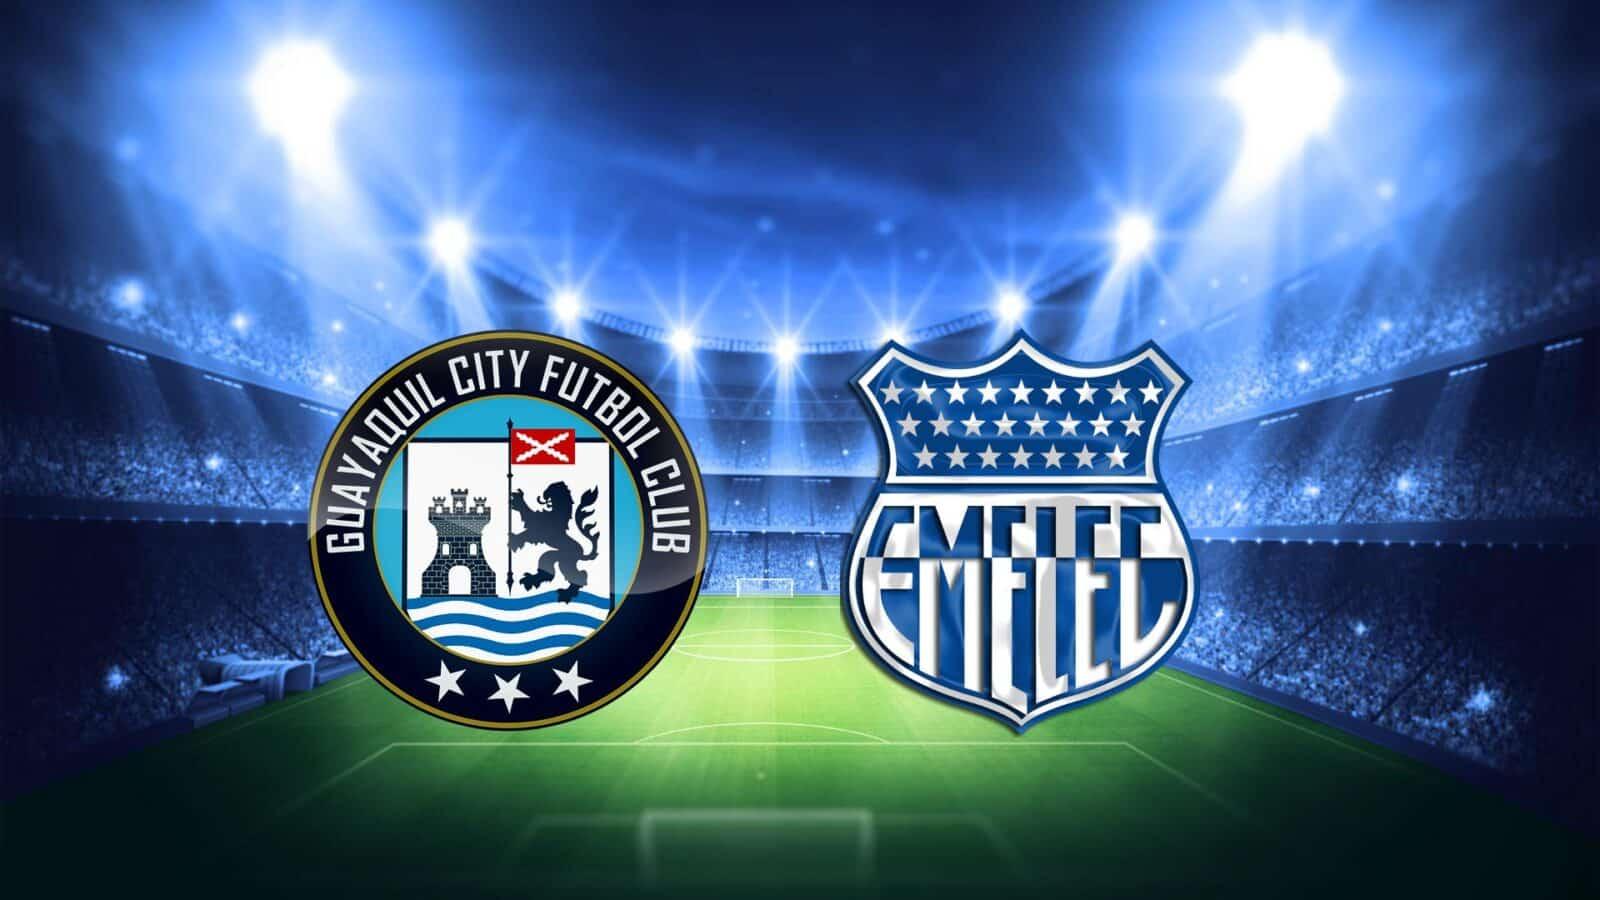 Debut oficial de Guayaquil City FC será ante Emelec